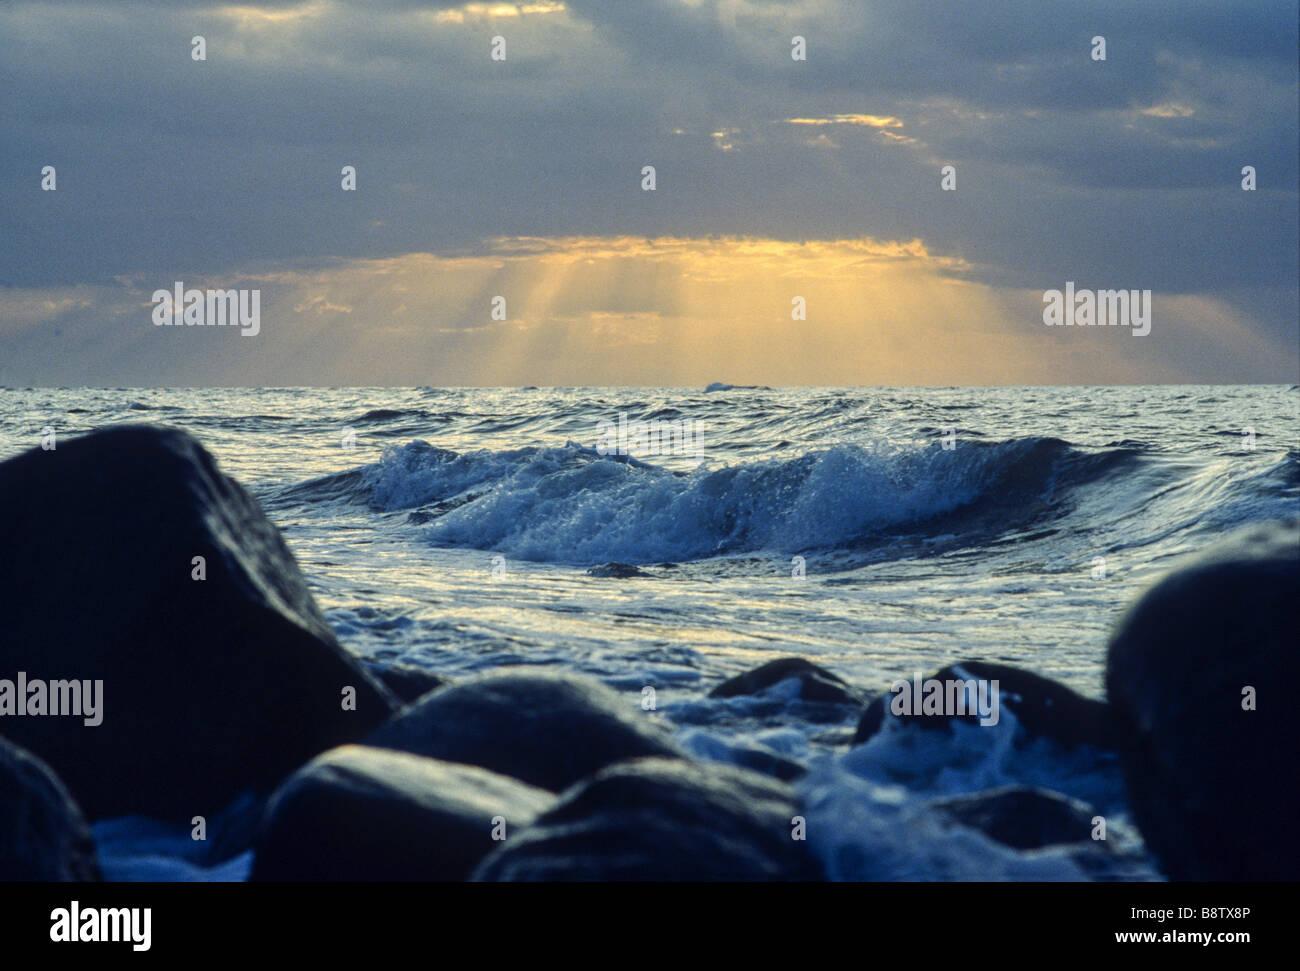 At the North Coast of Zealand, Denmark. - Stock Image